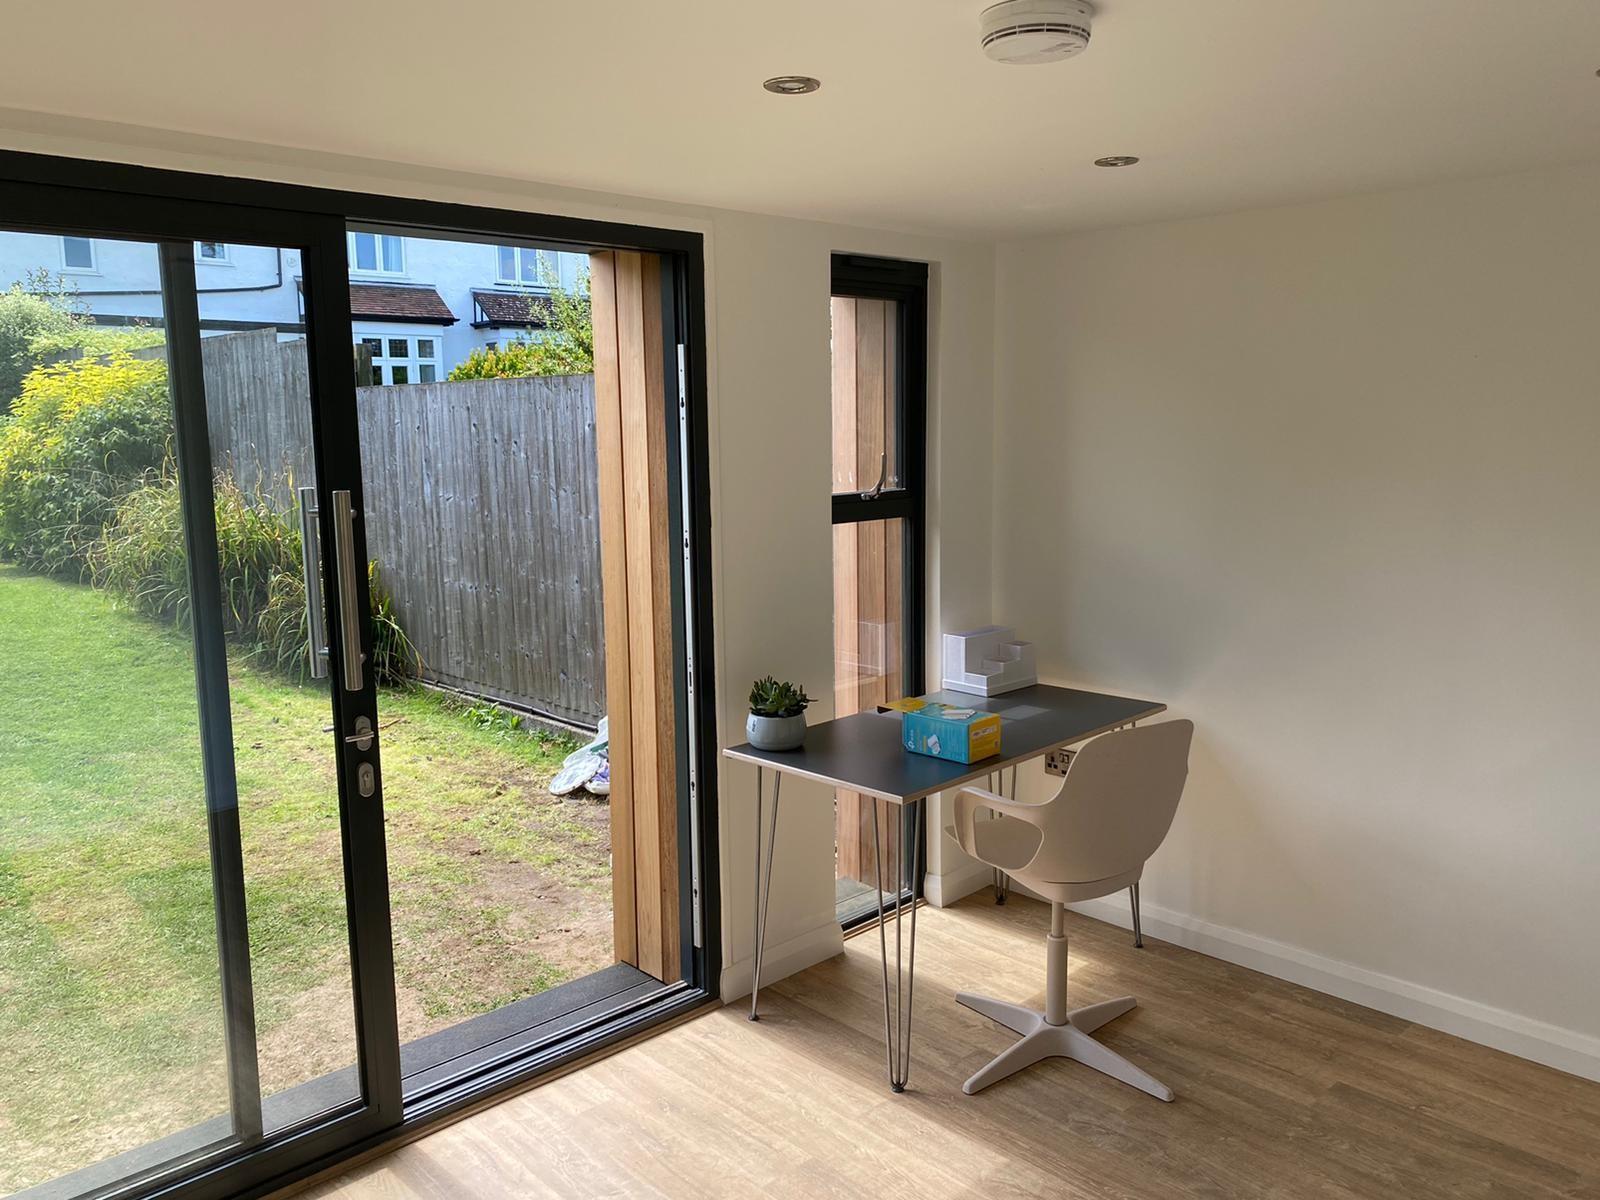 Garden office interior - Bristol